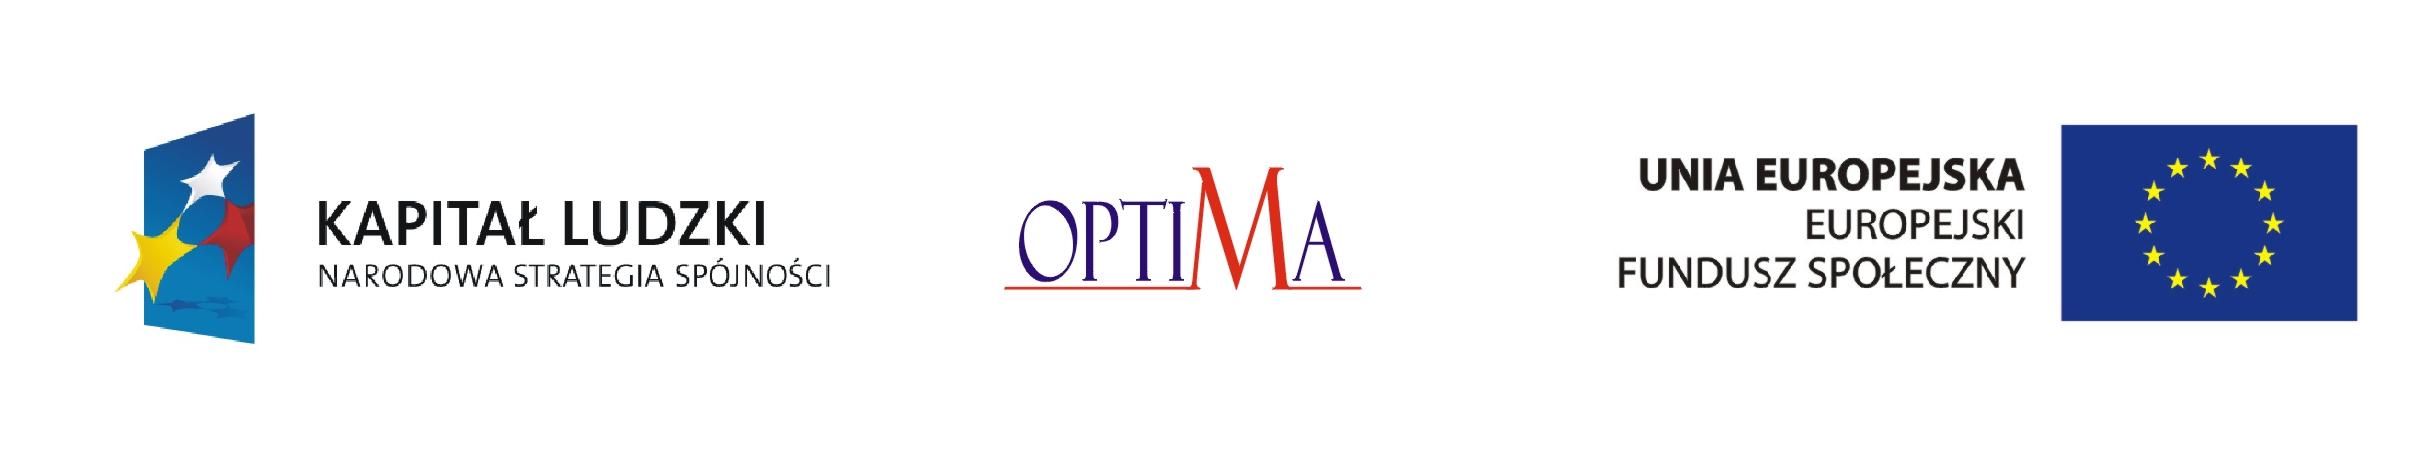 kolor_pokl_optima_unia_efs